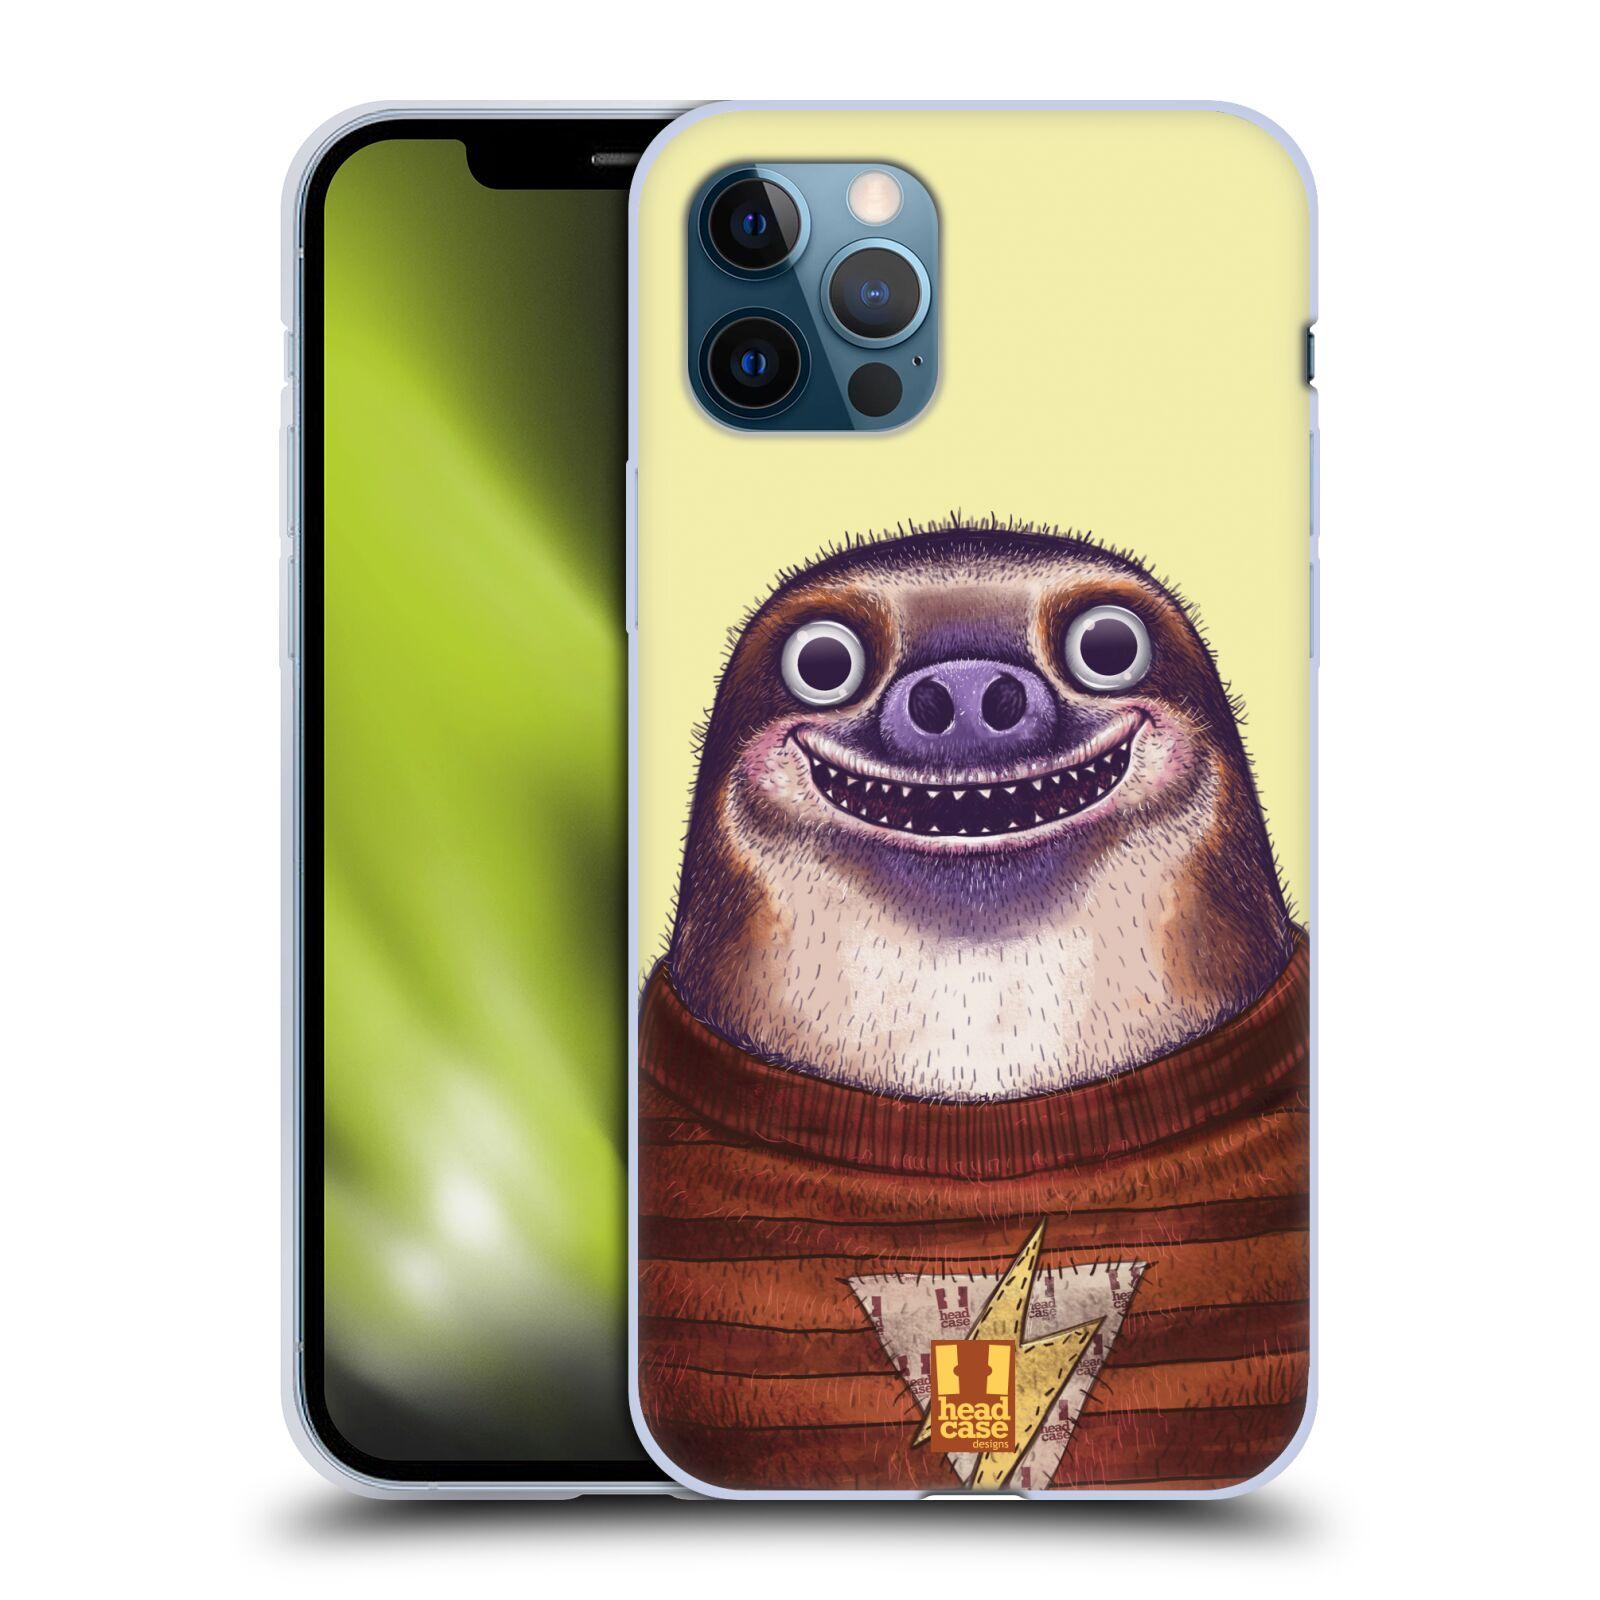 Silikonové pouzdro na mobil Apple iPhone 12 / 12 Pro - Head Case - ANIMPLA LENOCHOD